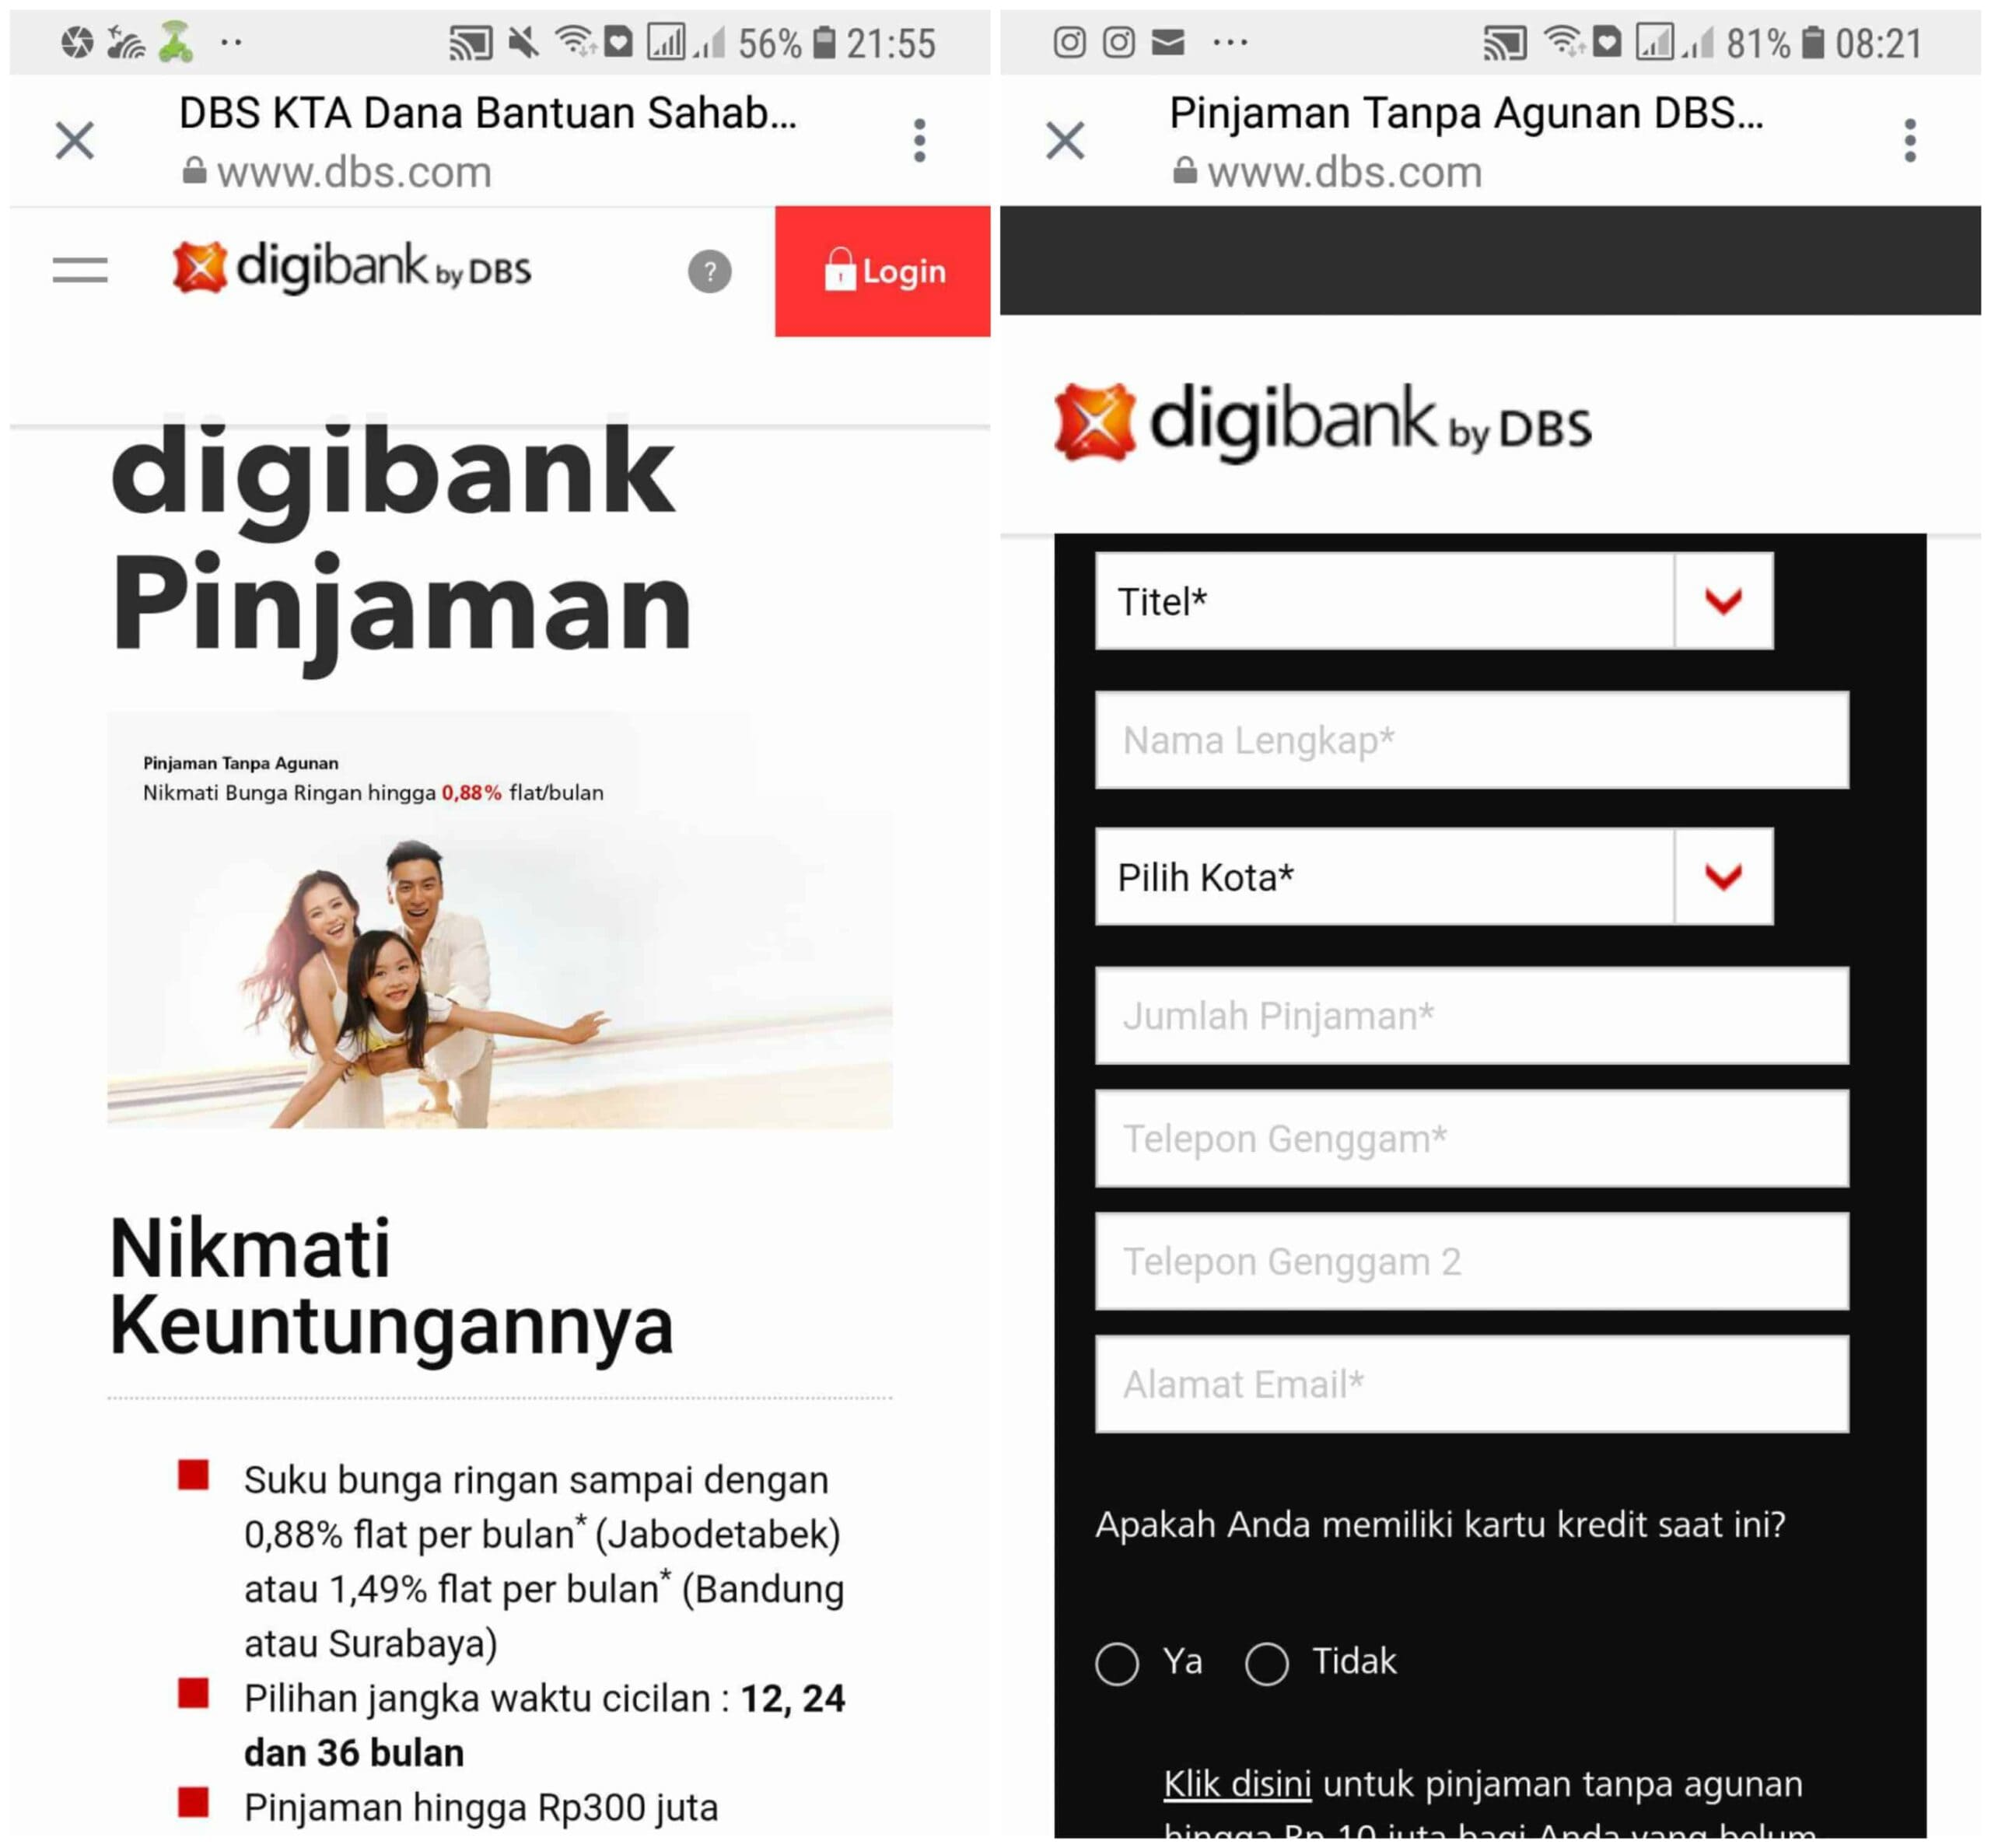 KTA DBS Online Digibank 2019